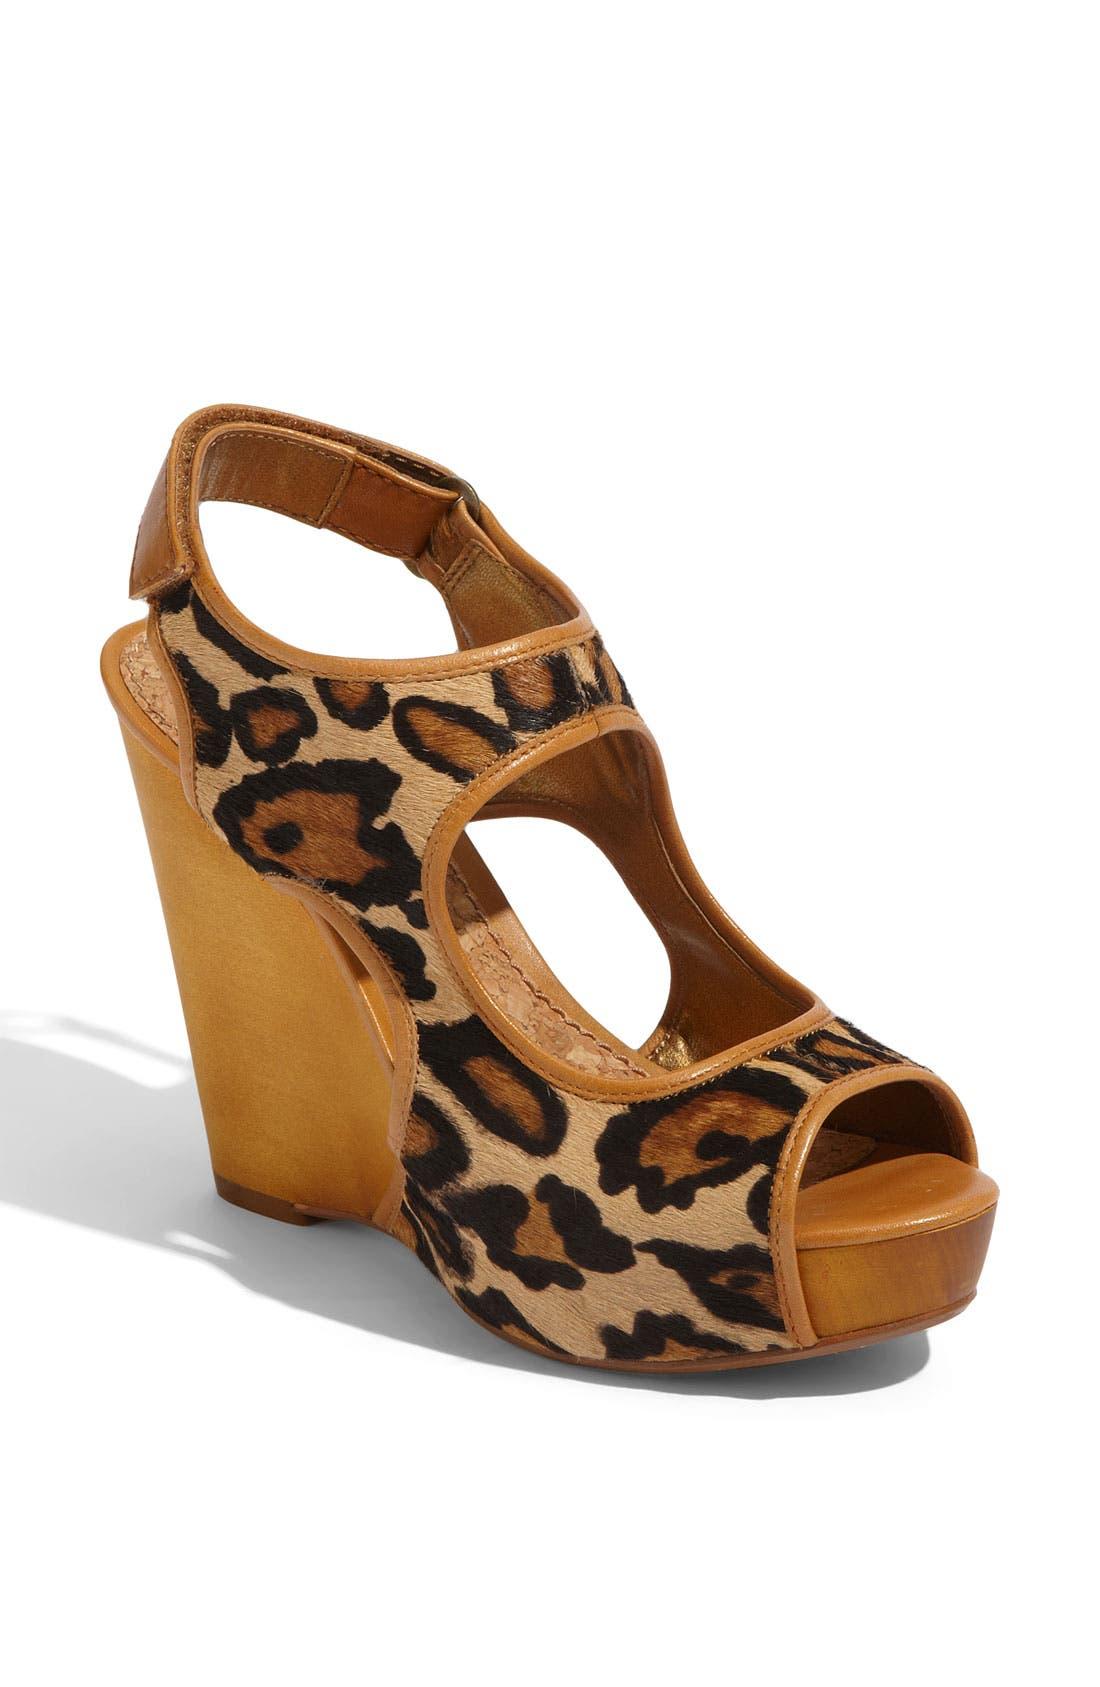 Alternate Image 1 Selected - Sam Edelman 'Kendall' Wedge Sandal